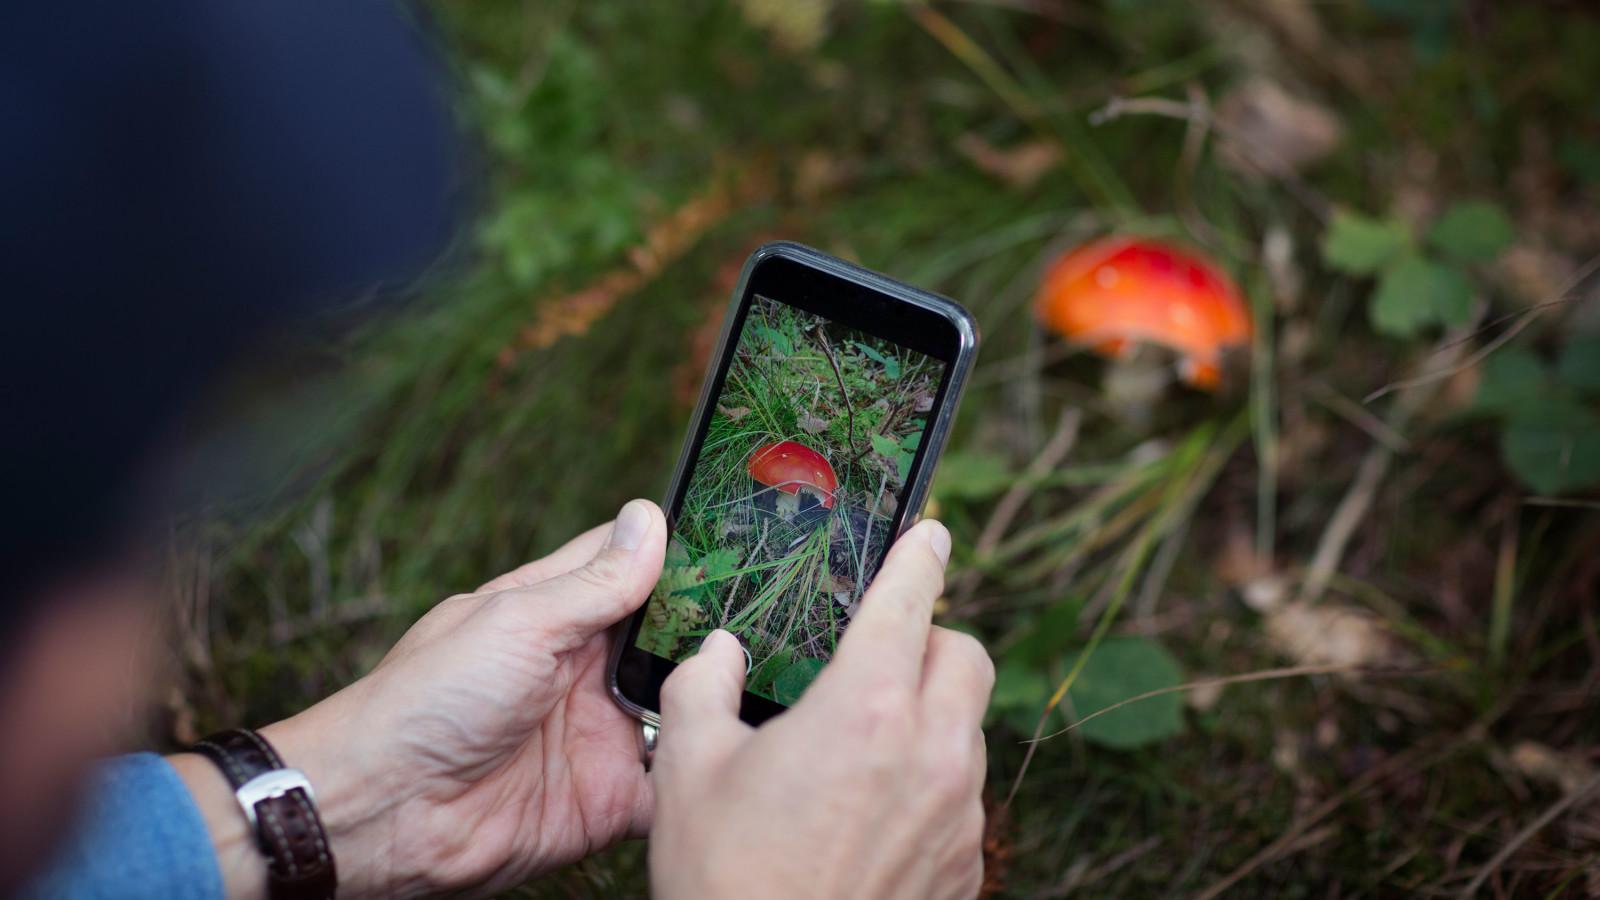 Smartphone, Handy, Pflanze, Pilz, erkennen, App, Pflanzenerkennung